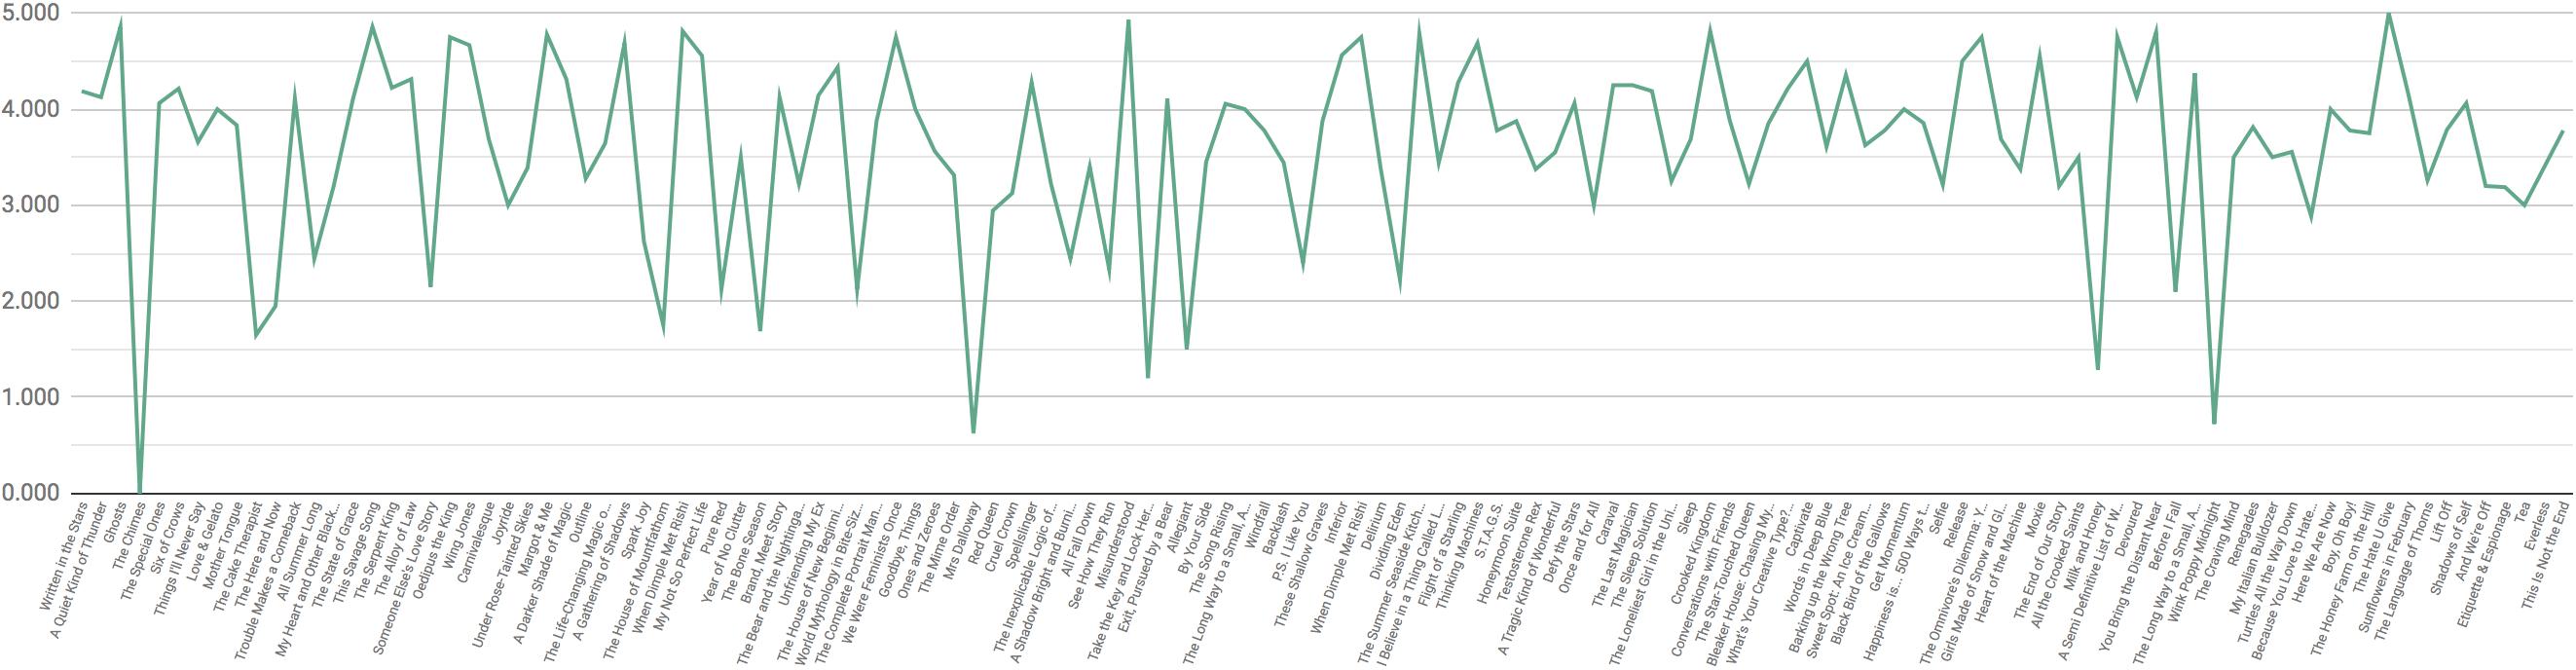 Book Rating Distribution 2017